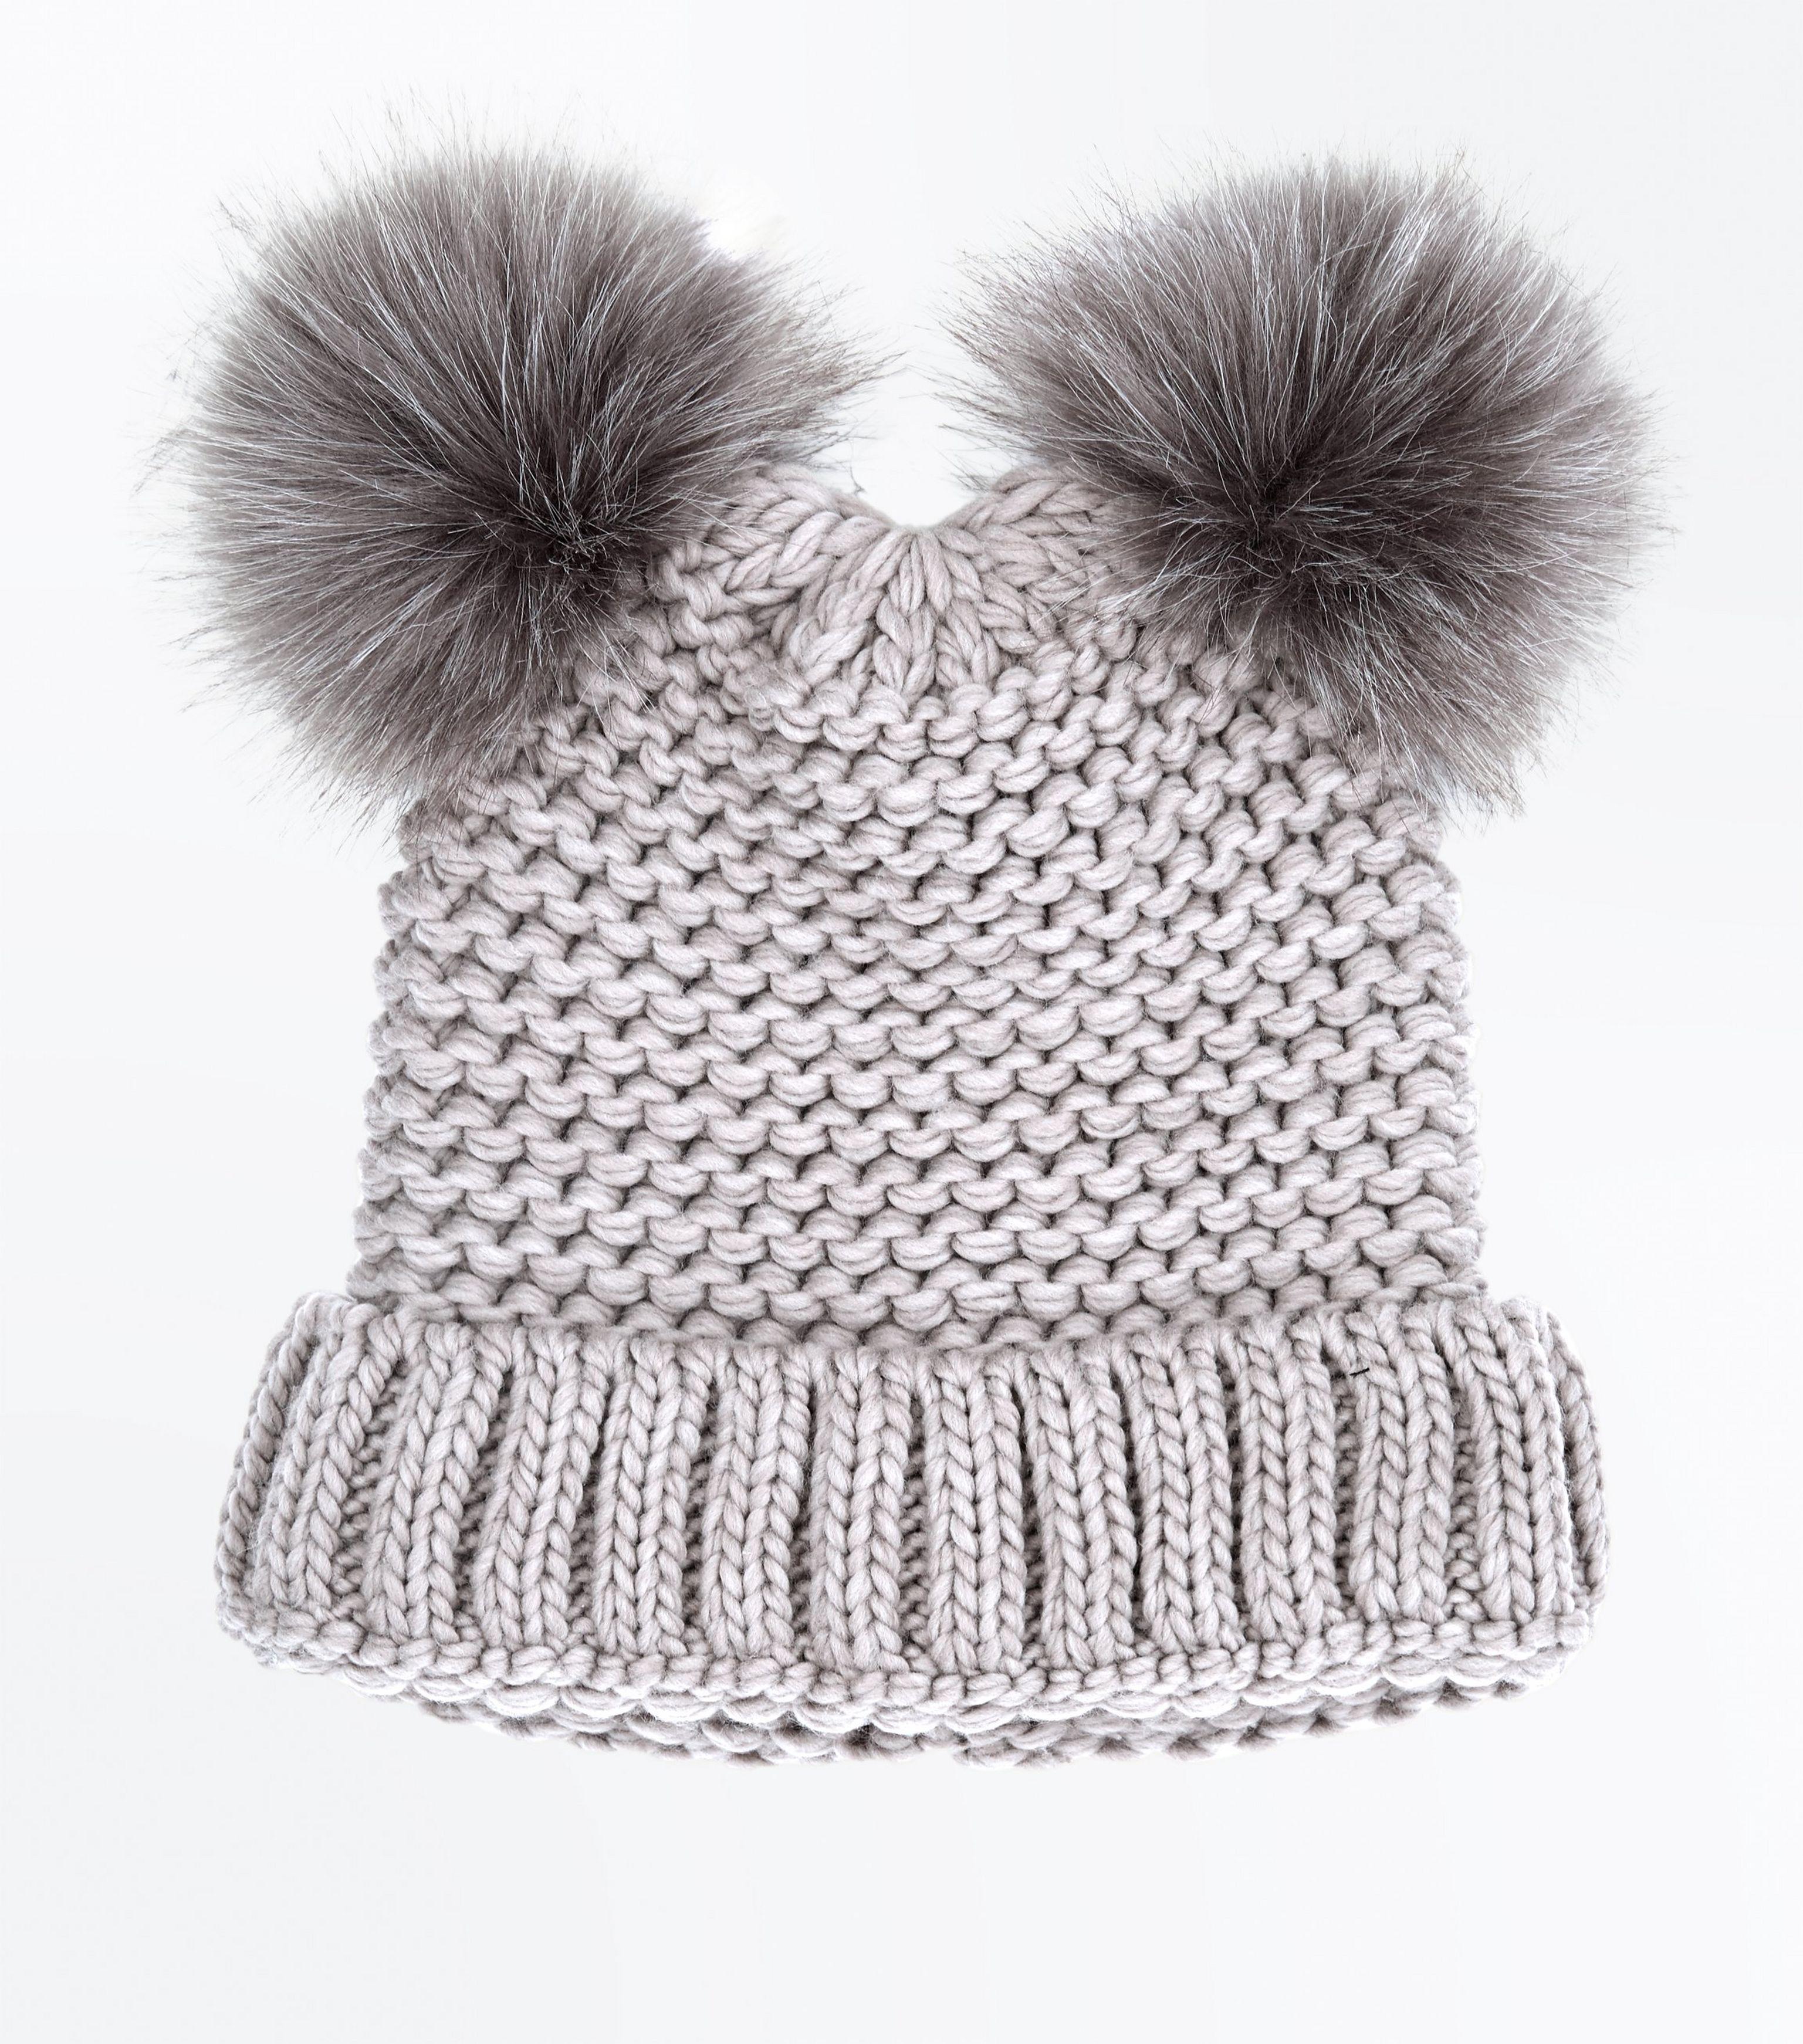 cfcf88d4c9f New Look Mink Double Faux Fur Pom Pom Hat - Lyst